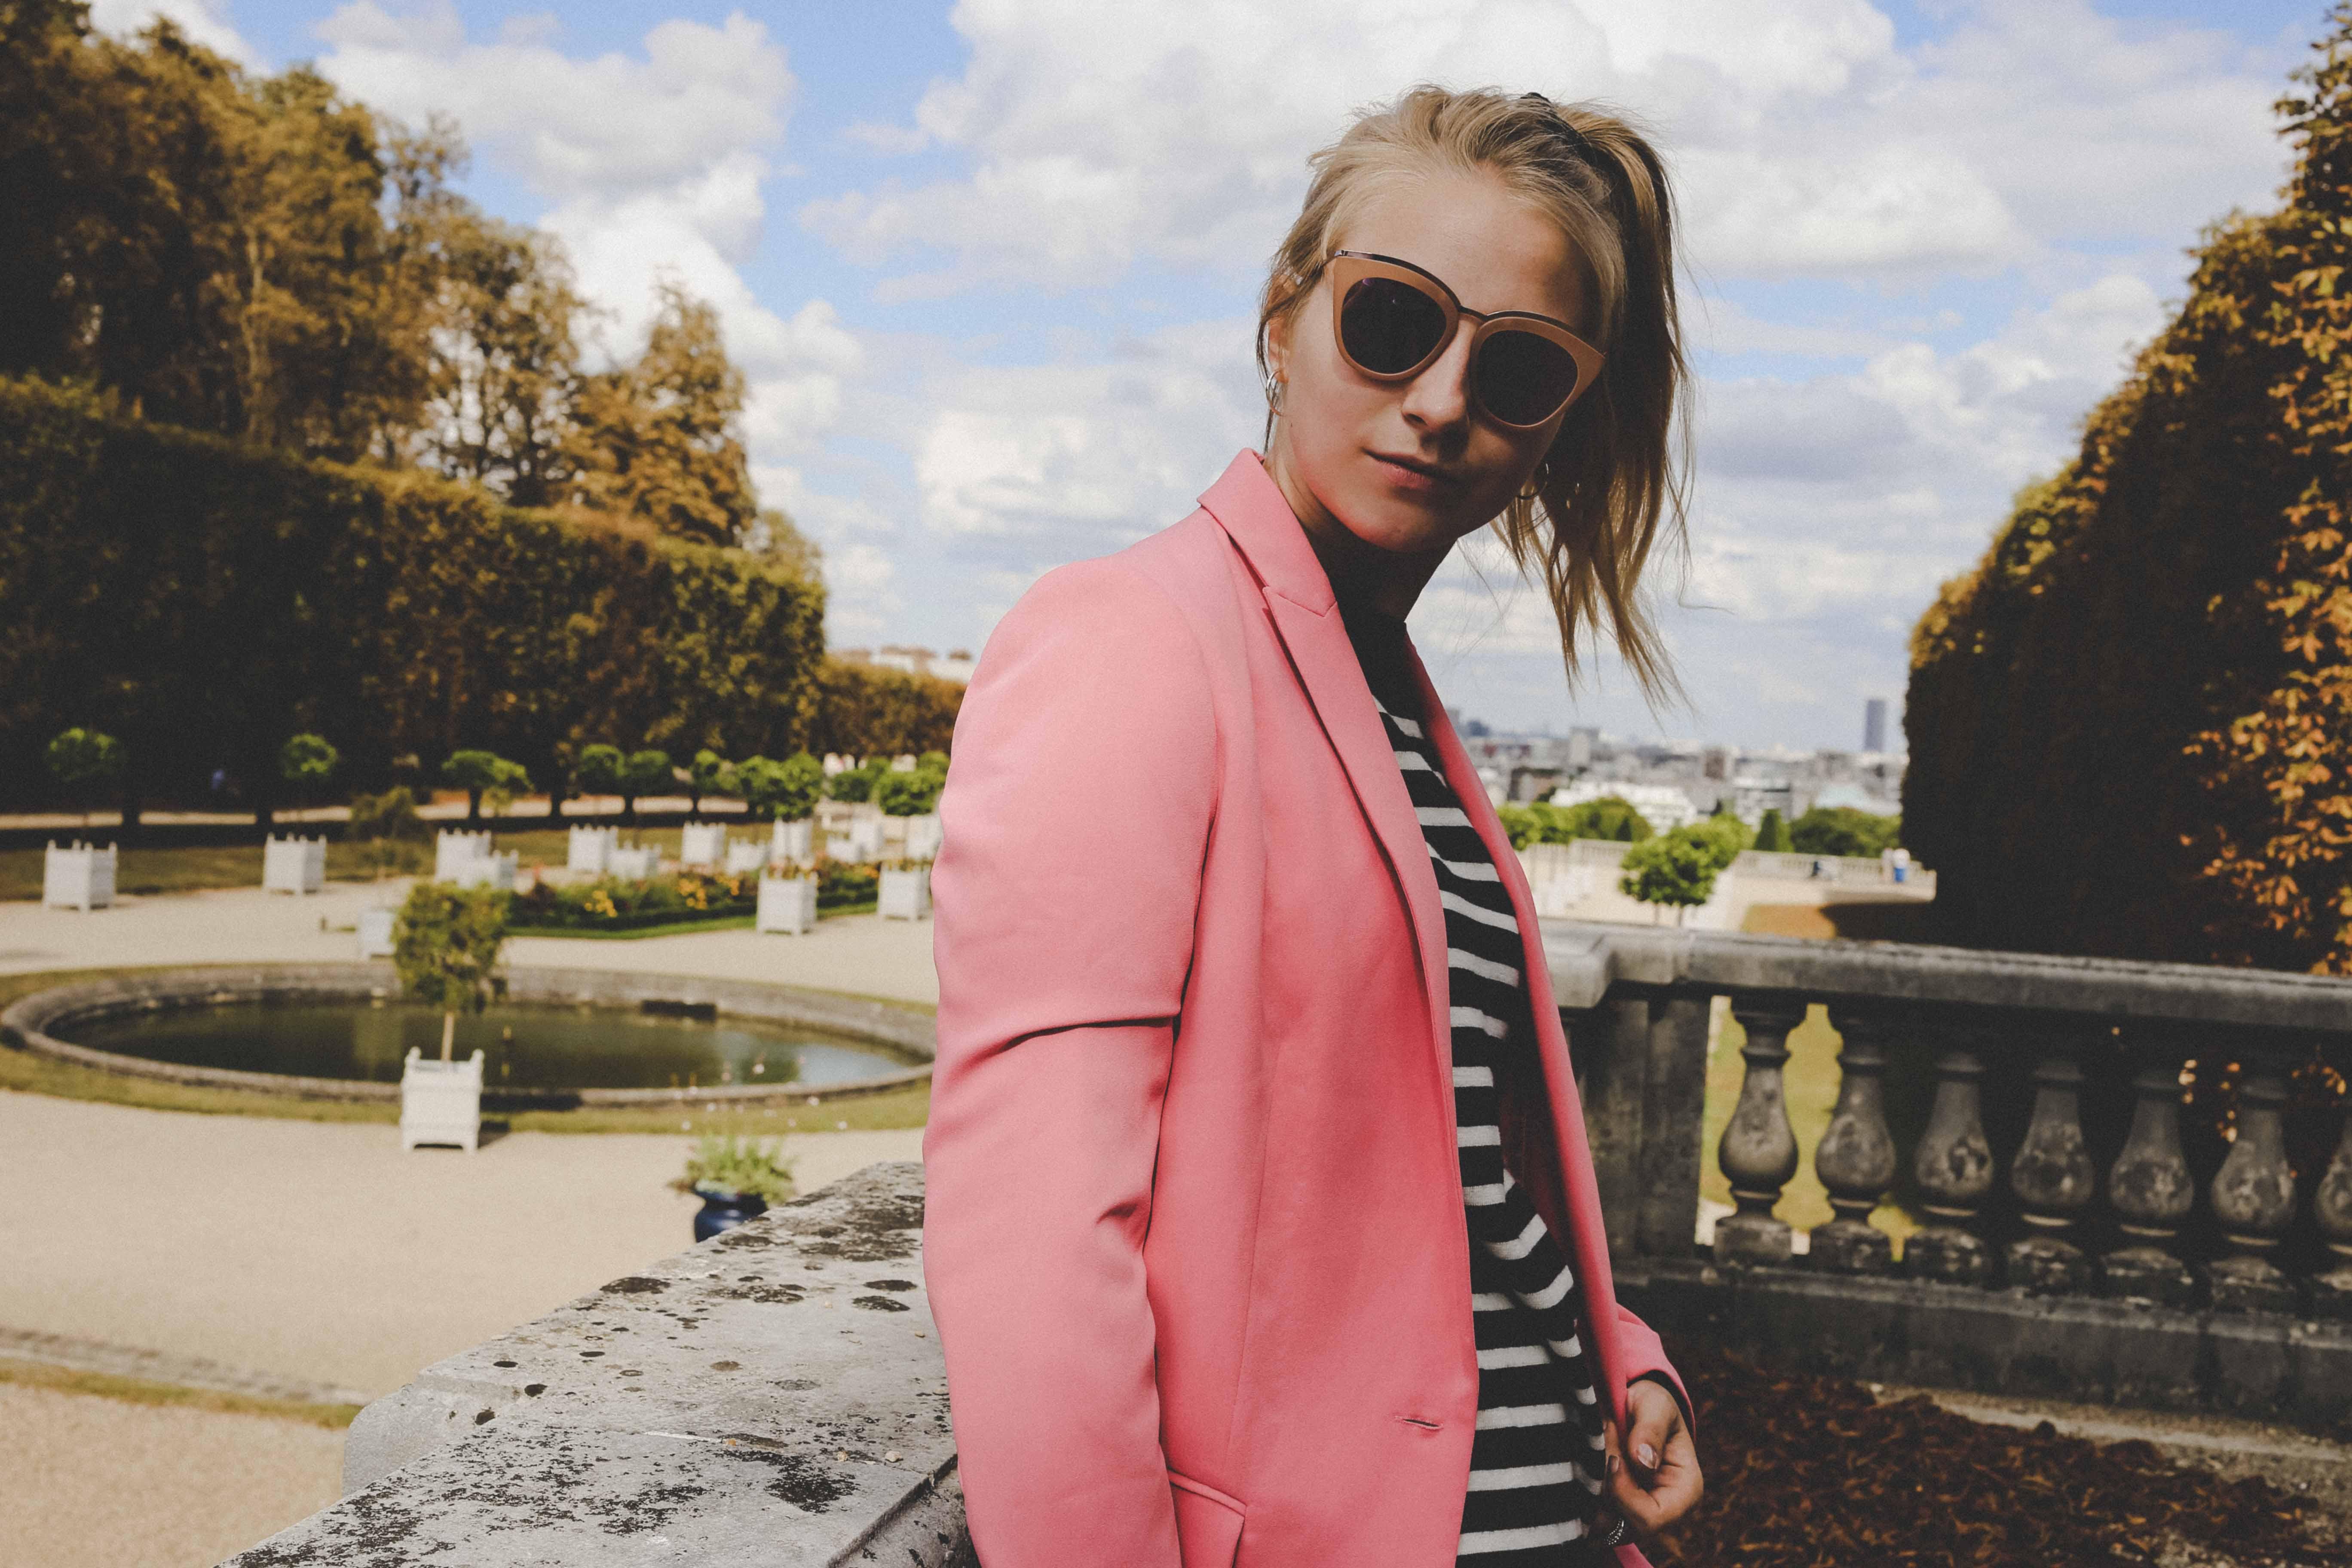 trendreport-pinker-hosenanzug-pink-suit-how-to-paris-fashionblog-modeblog-outfit_1902